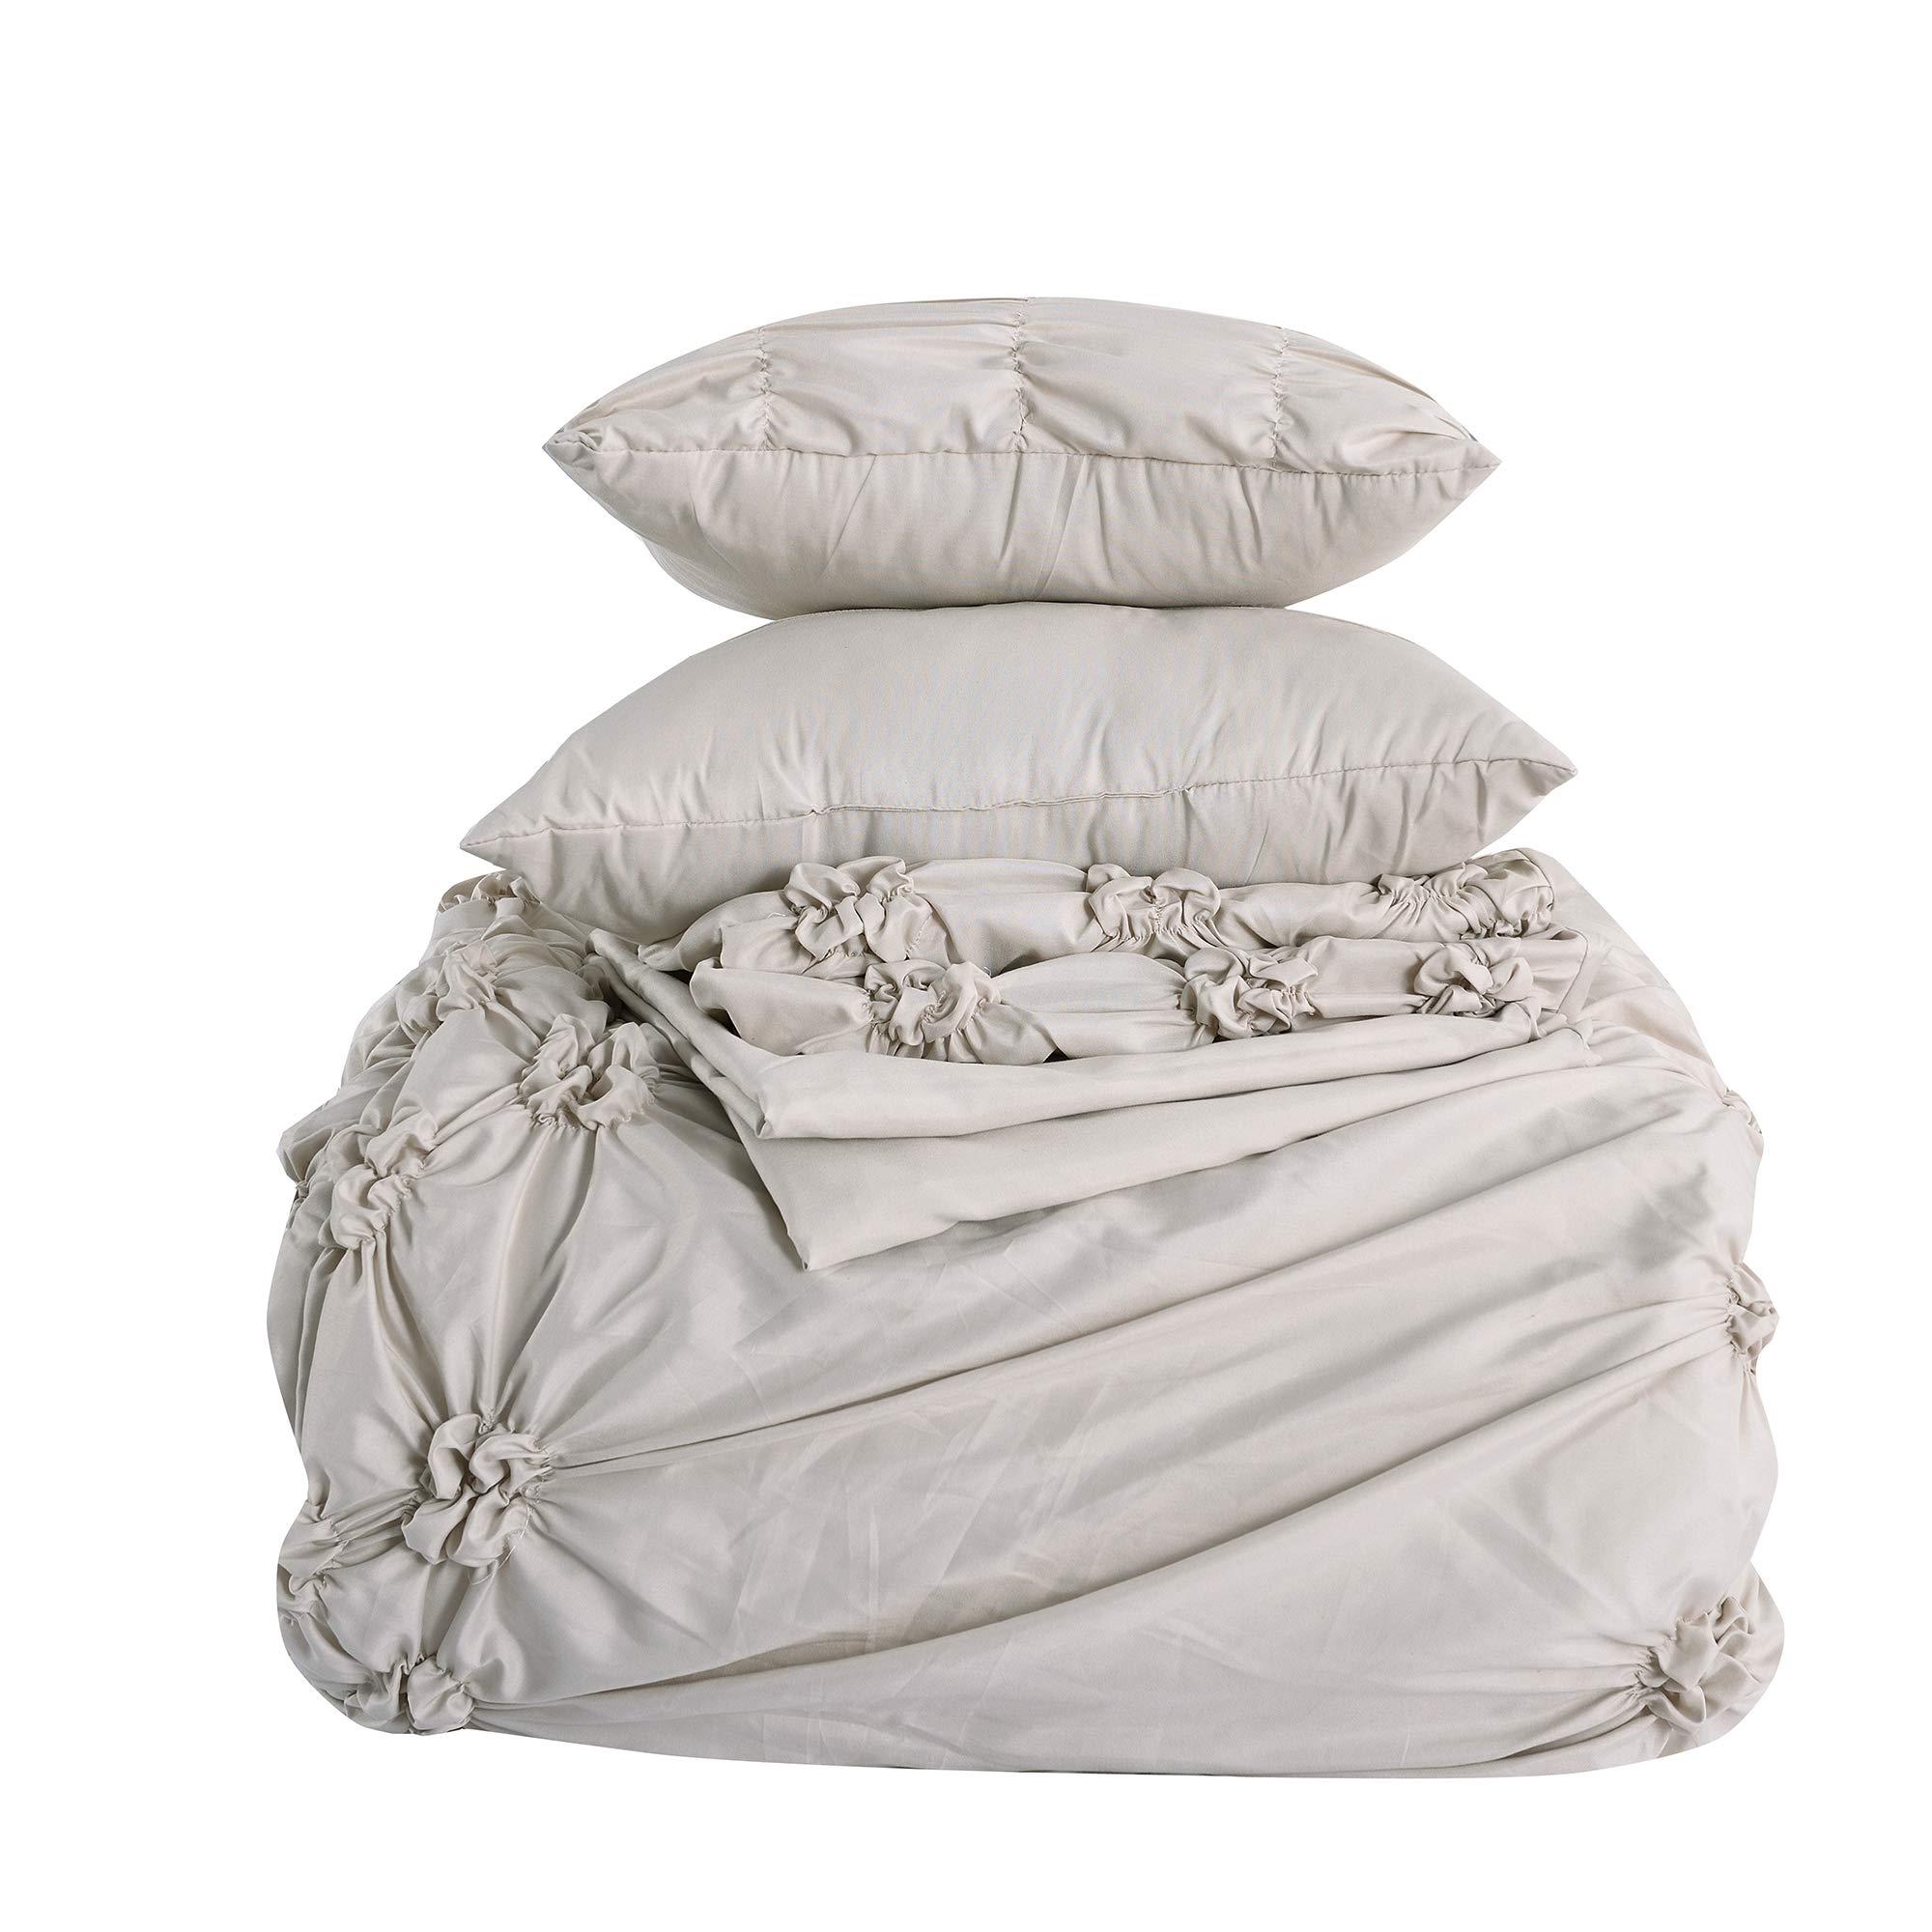 Amrapur Overseas 8-Piece Sophie Comforter Set, King/California King, Sand by Amrapur Overseas (Image #3)